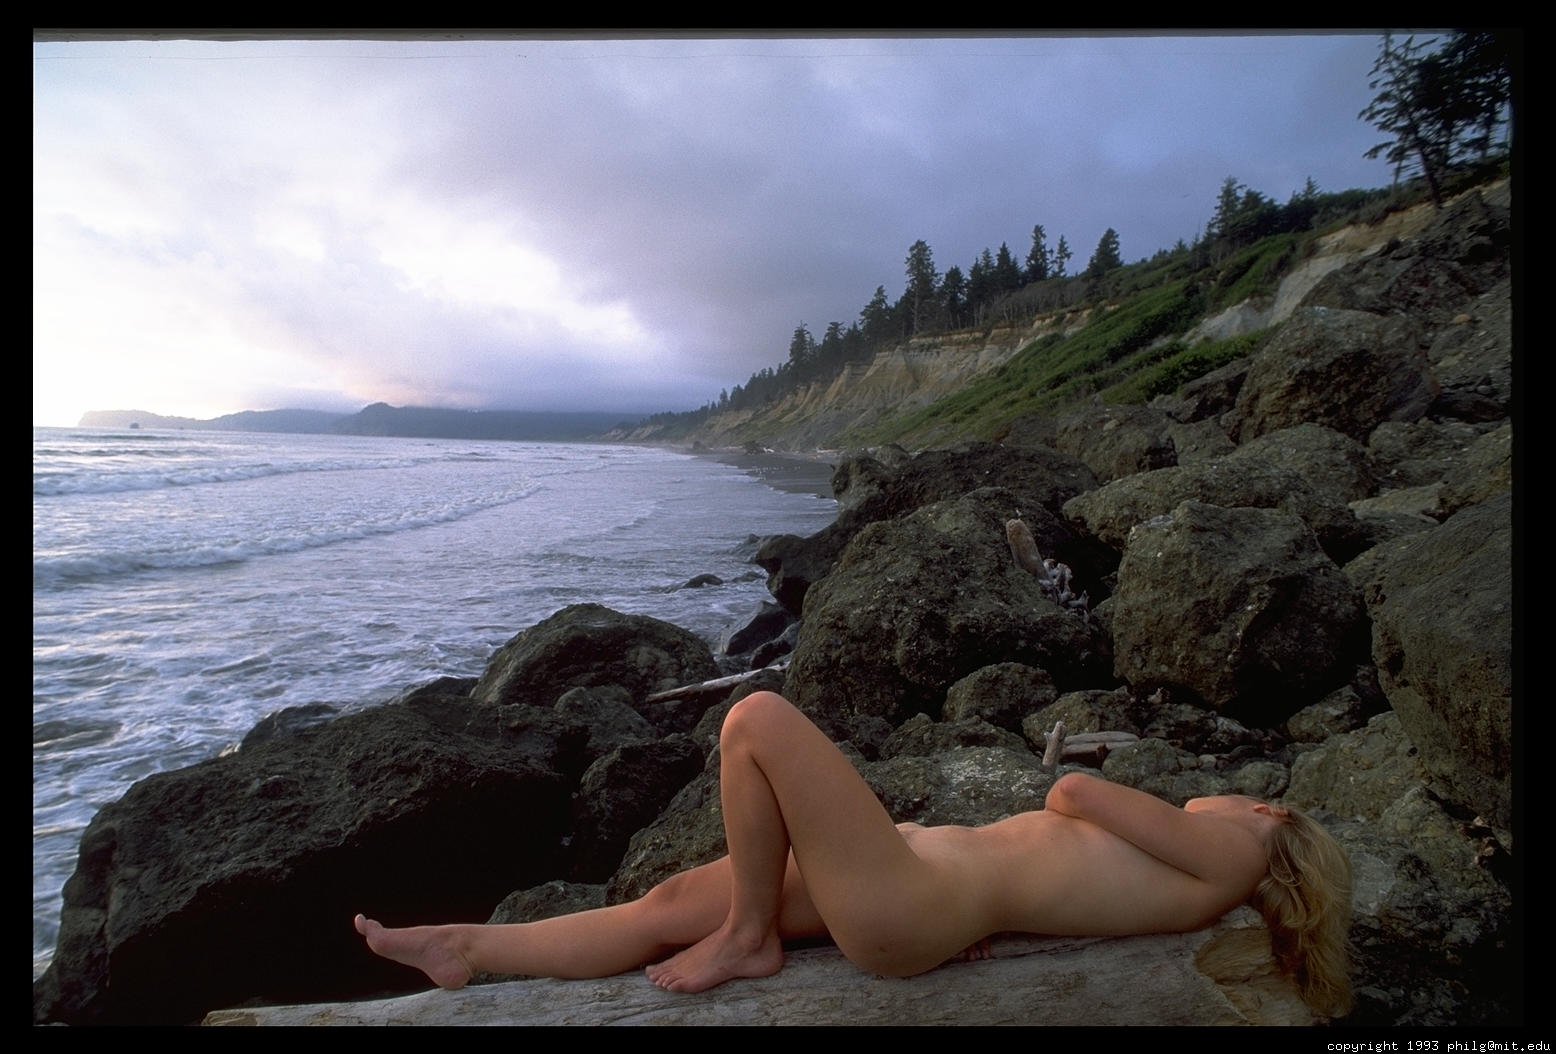 Elle liberachi nude pics